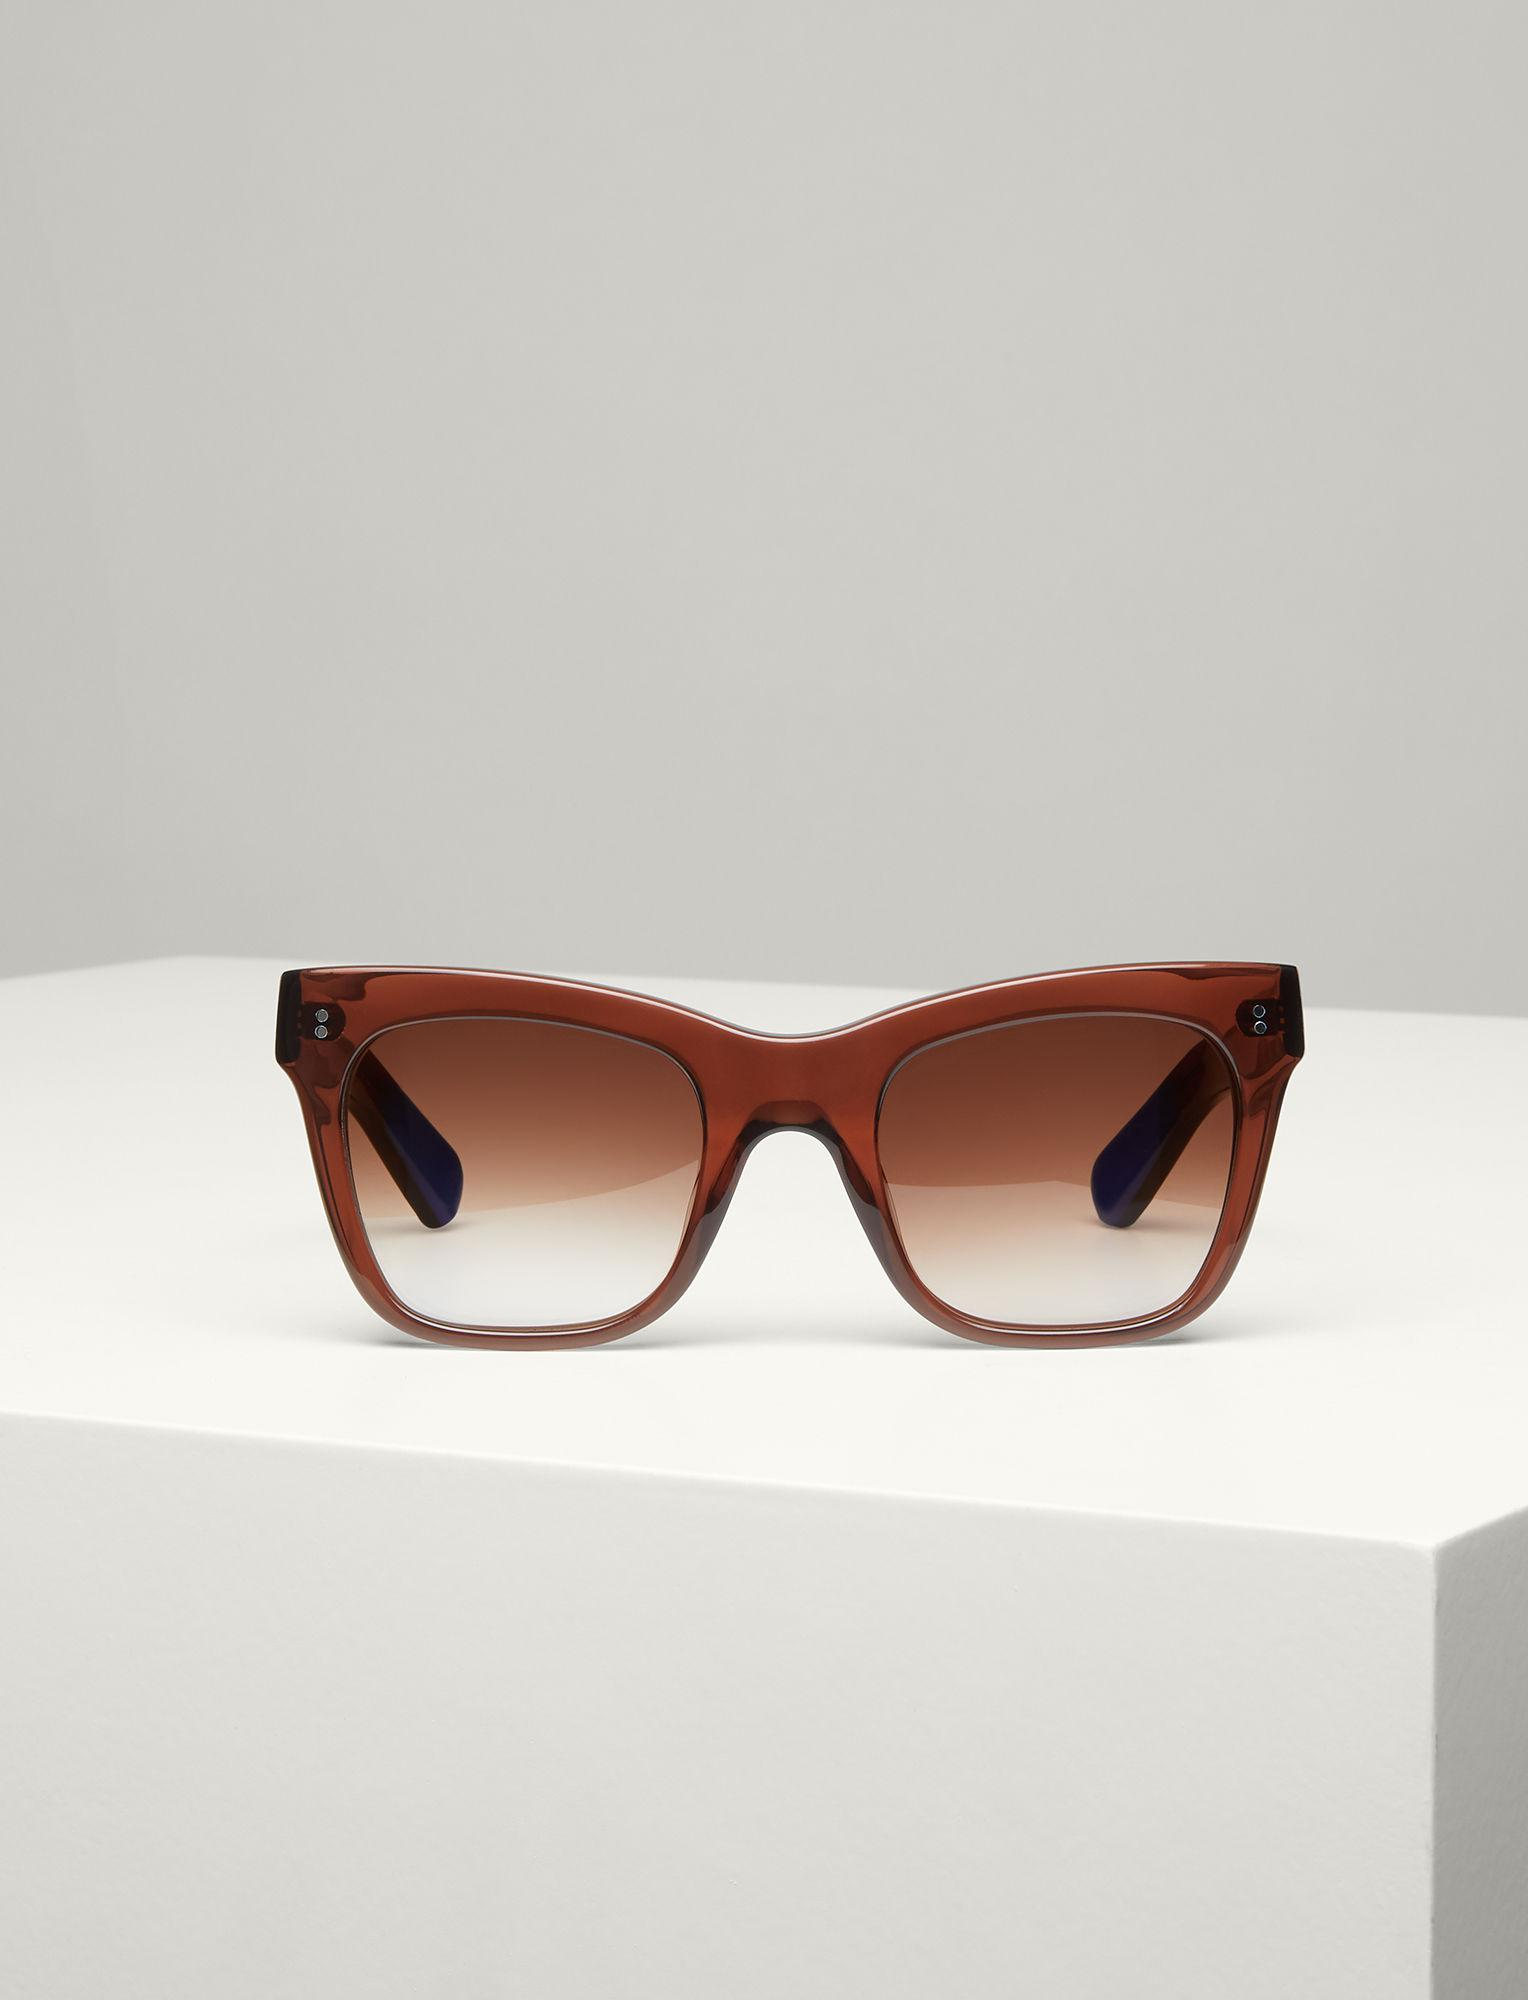 Draycott sunglasses - Brown Joseph 2dYIjEF